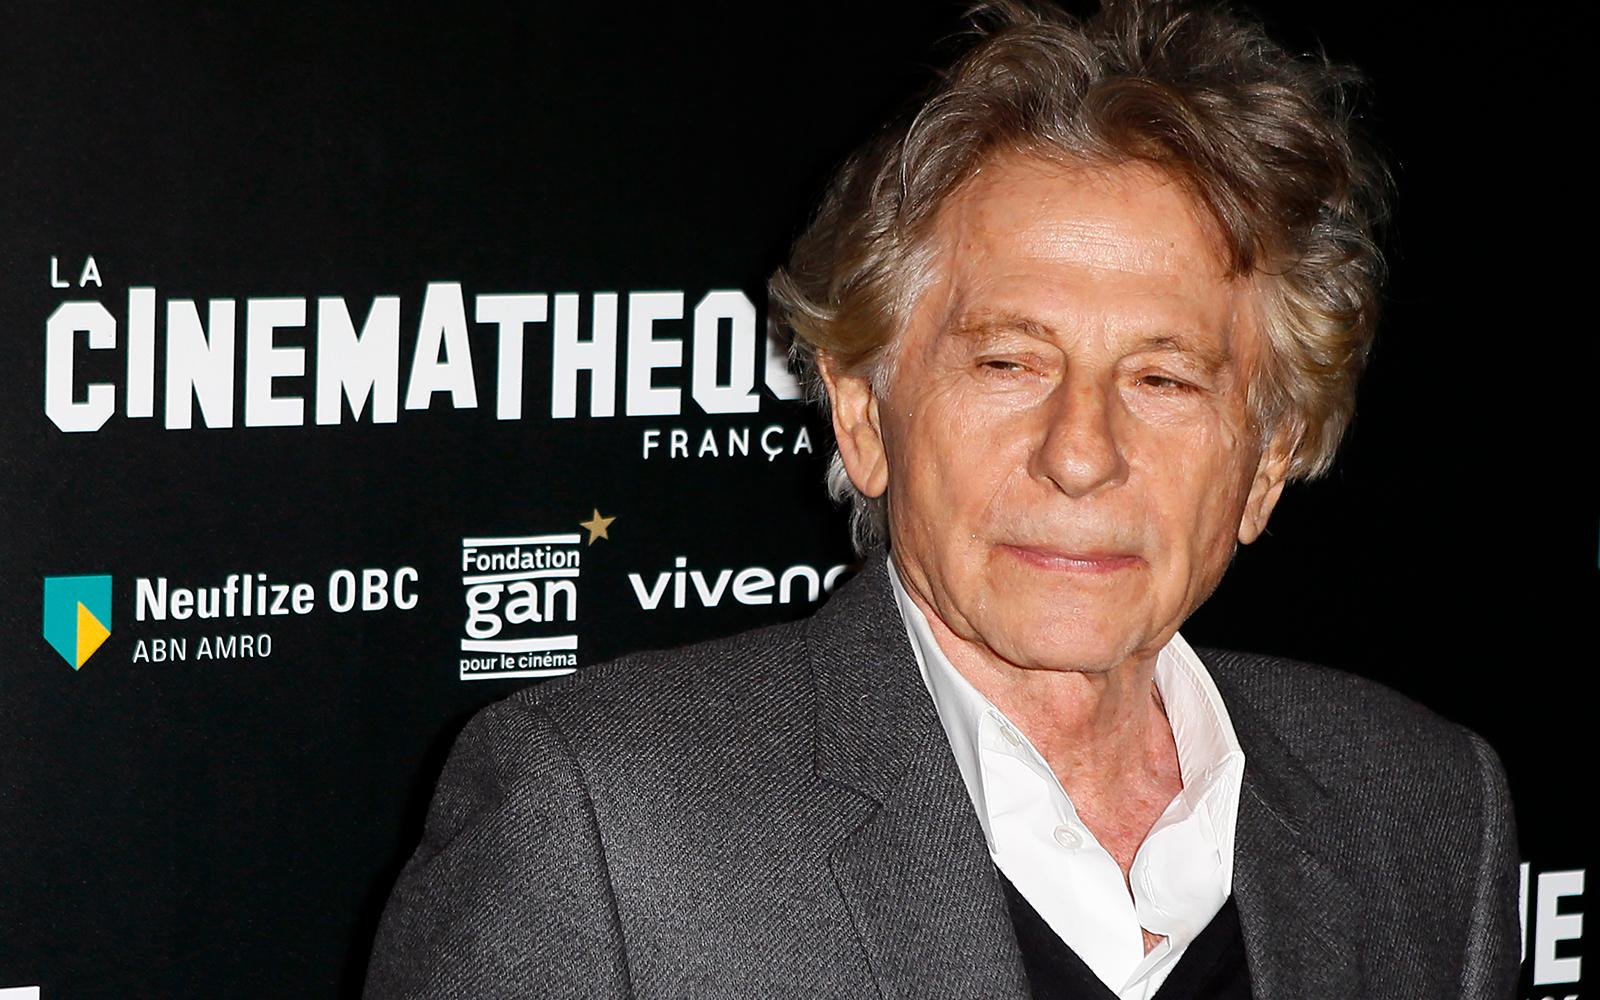 'Joker' wins 'Golden Lion' award at Venice Film Festival